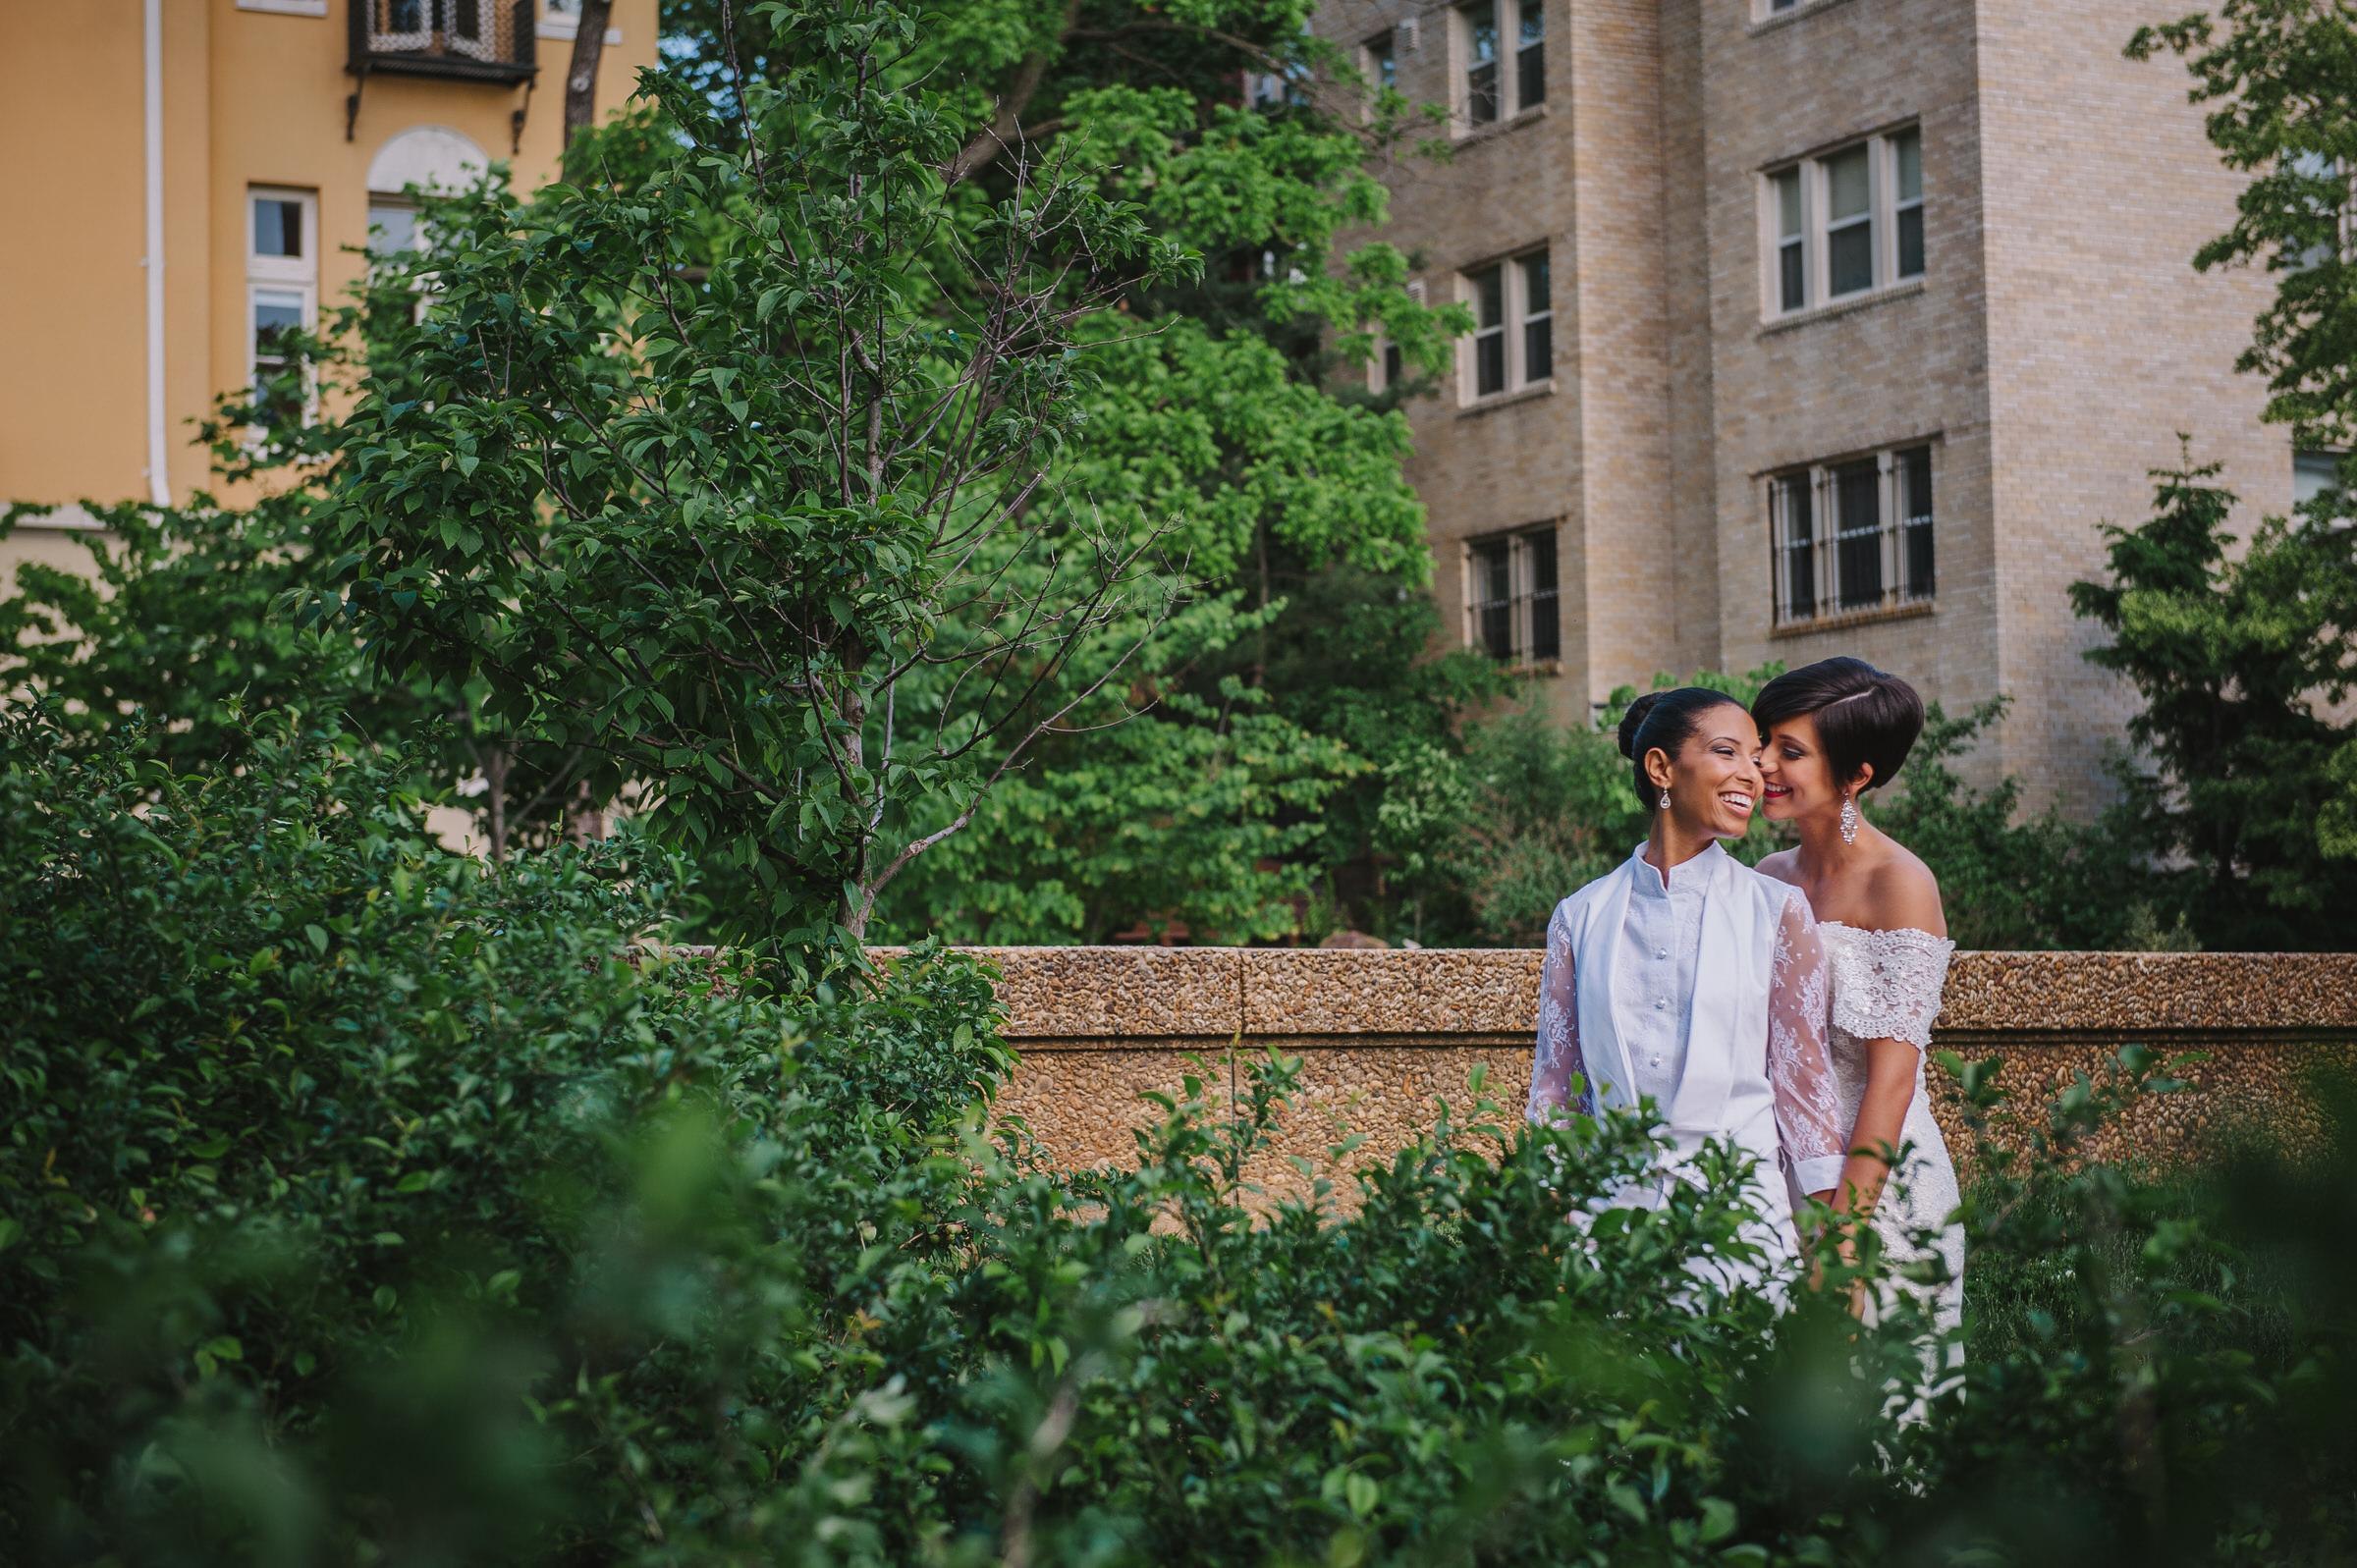 21-meridian-hill-park-LGBT-wedding-portrait